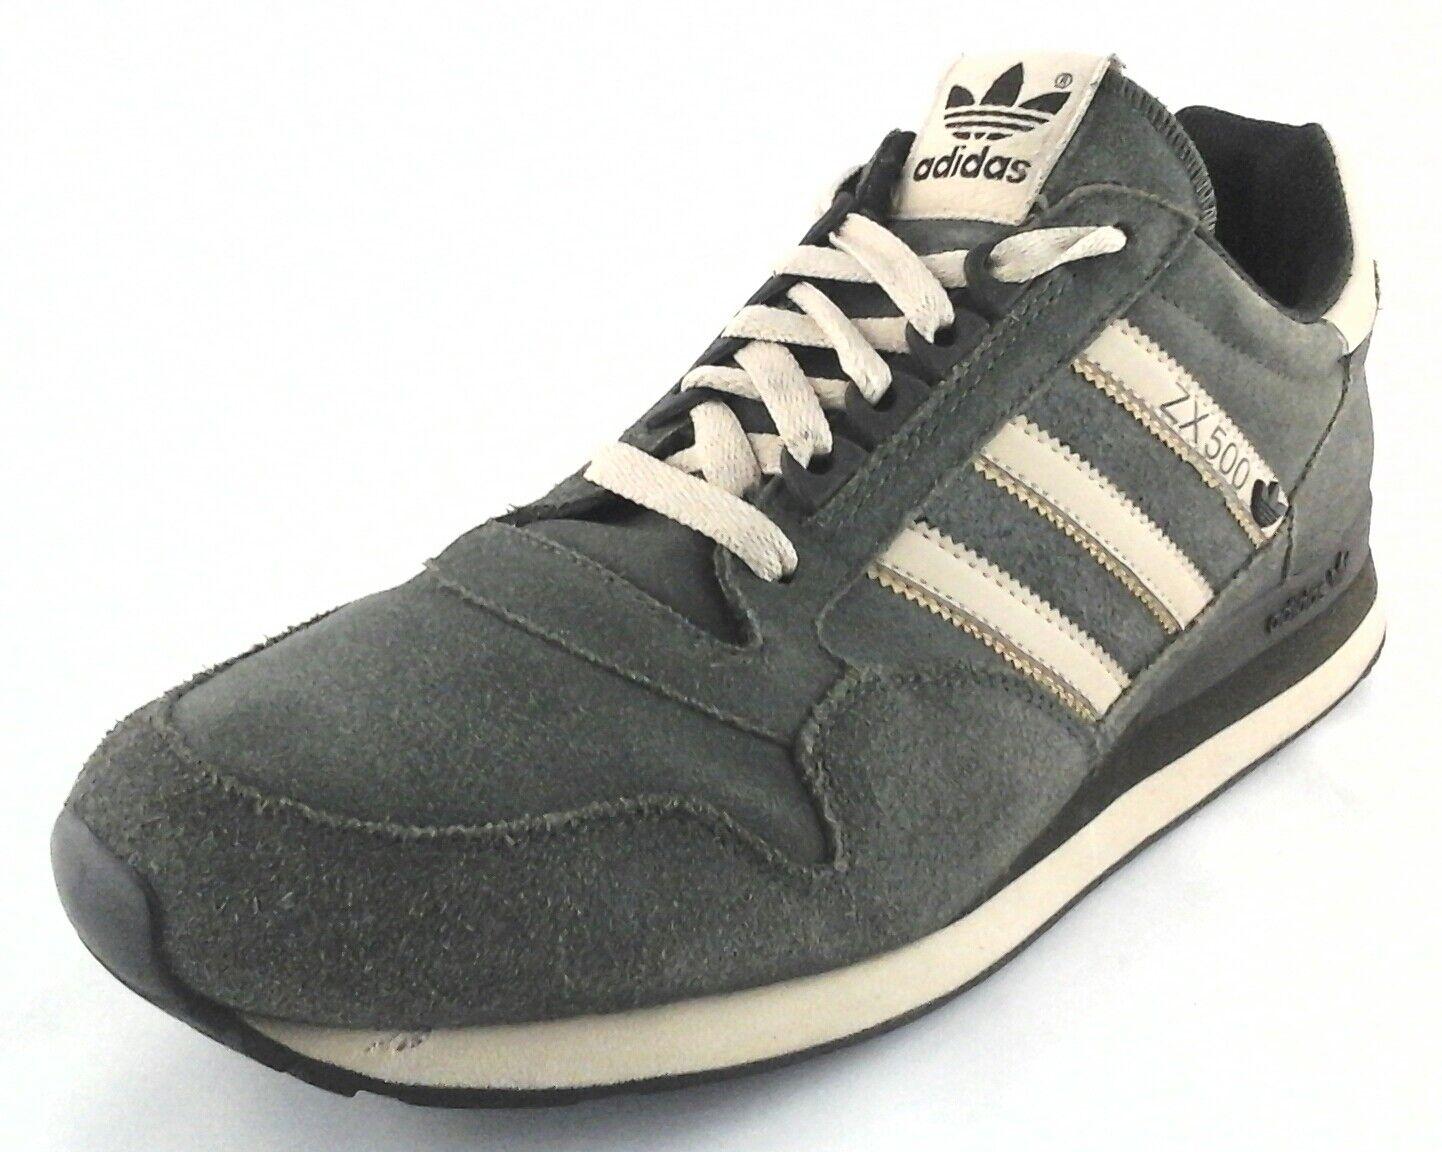 Adidas ZX 500 Trefoil Zapatos  para para para hombre estilo retro crema de salvia US 11.5 RU 11 UE 46 excelente condición usada poco común 6027bd